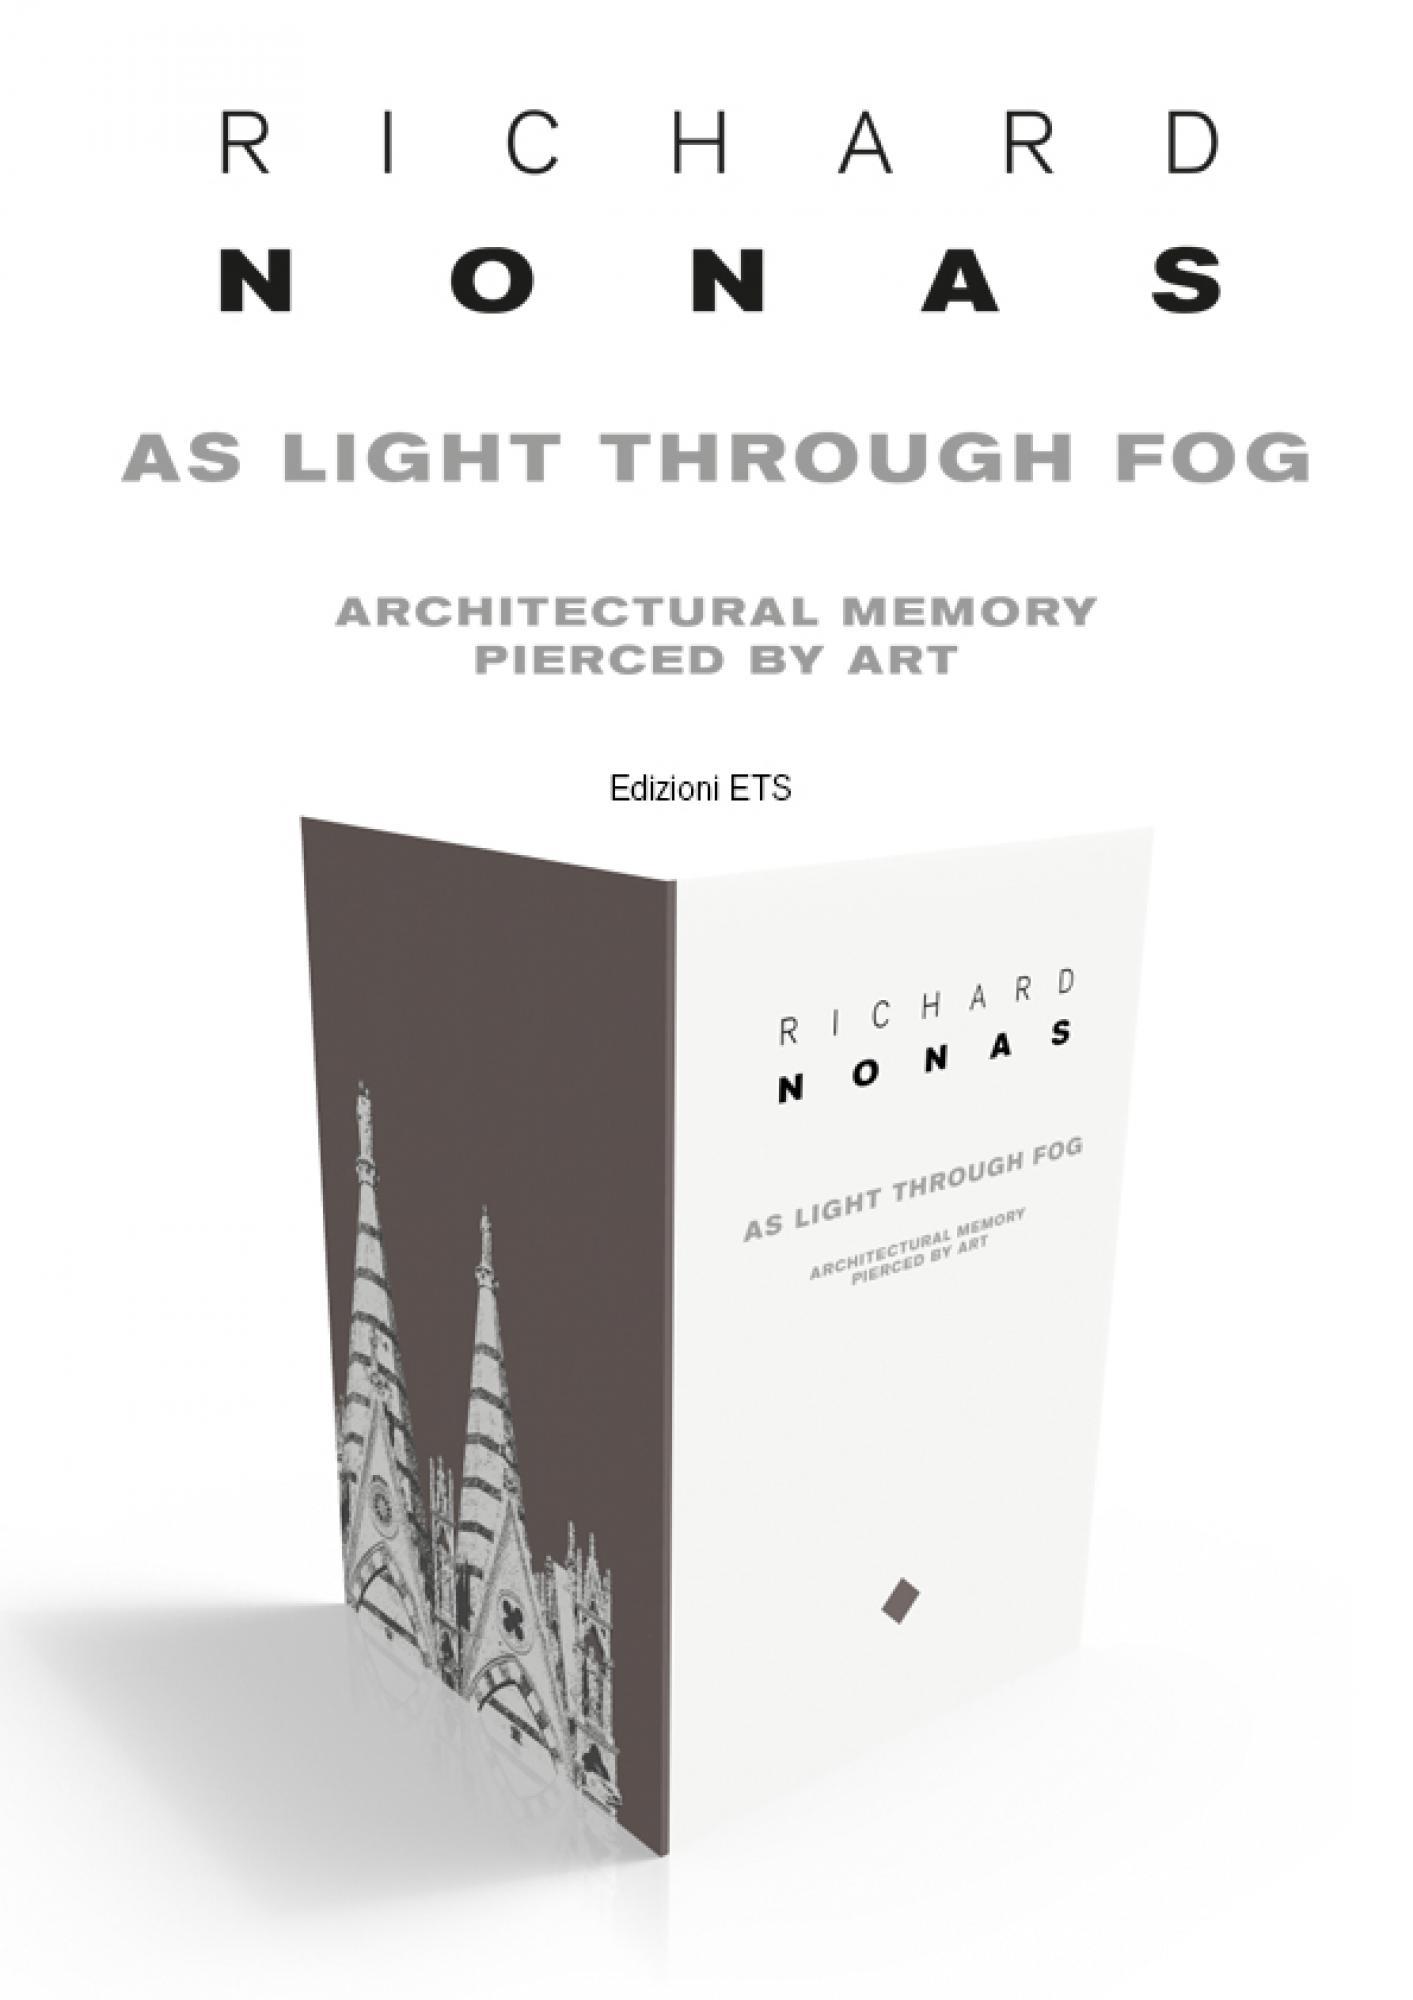 As light through fog.Architectural Memory Pierced by Art